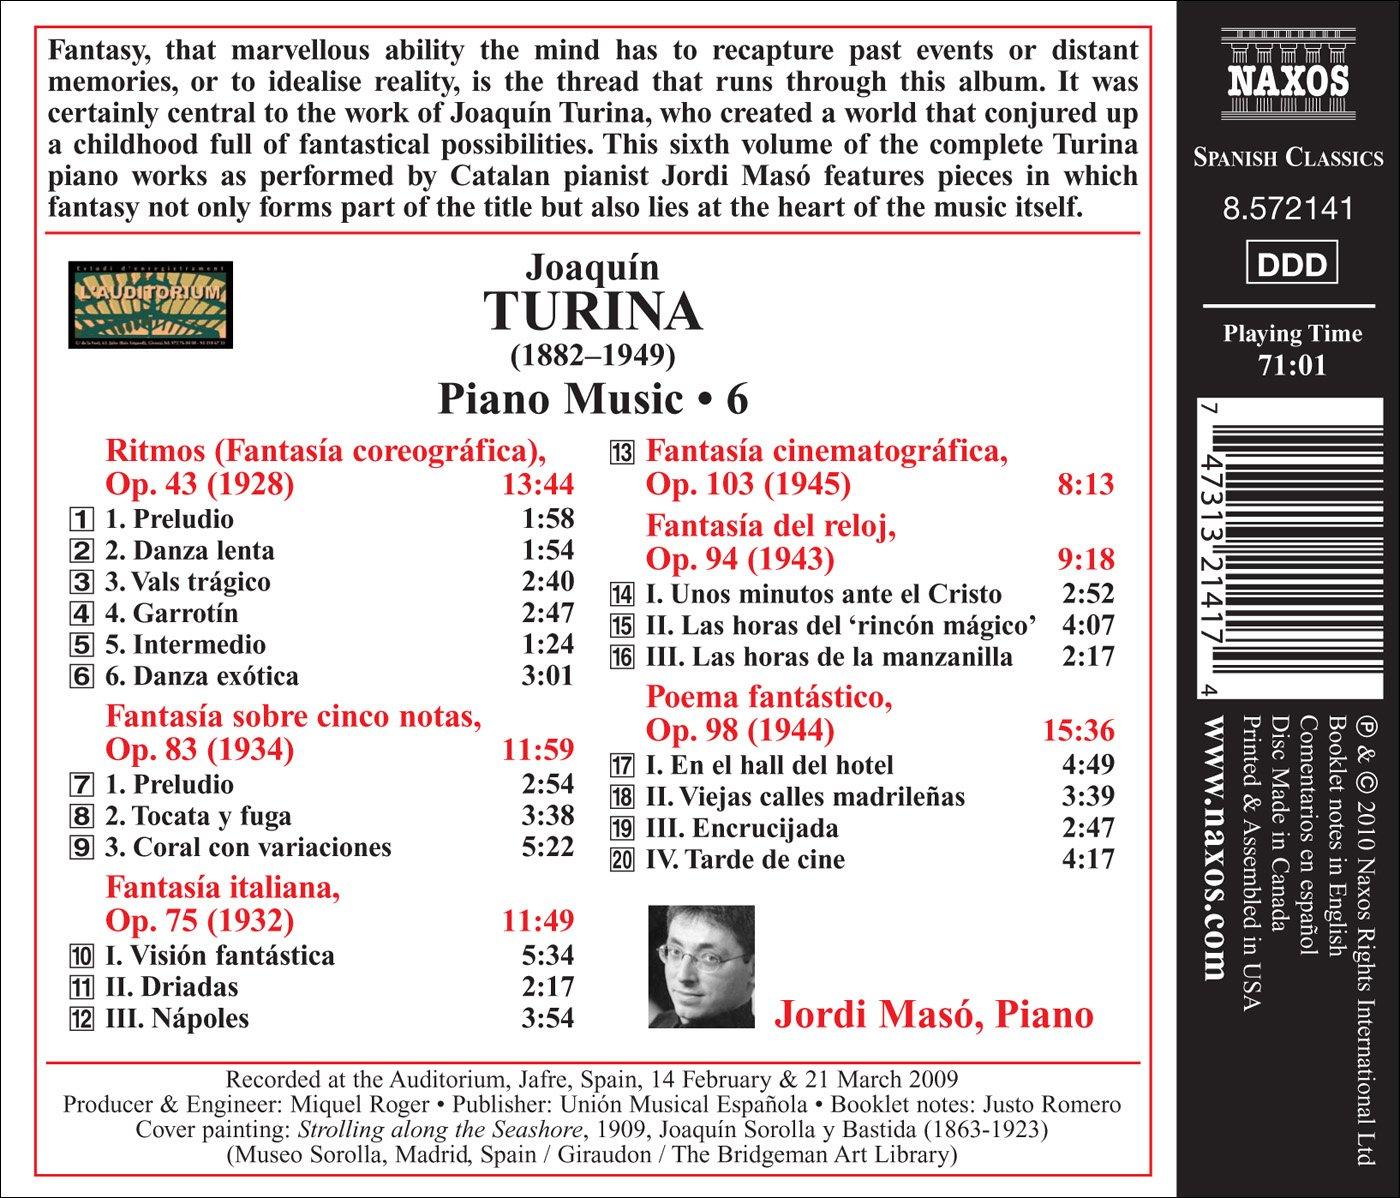 Joaquin Turina, Jordi Maso - Turina: Ritmos / Fantasia - Amazon.com Music